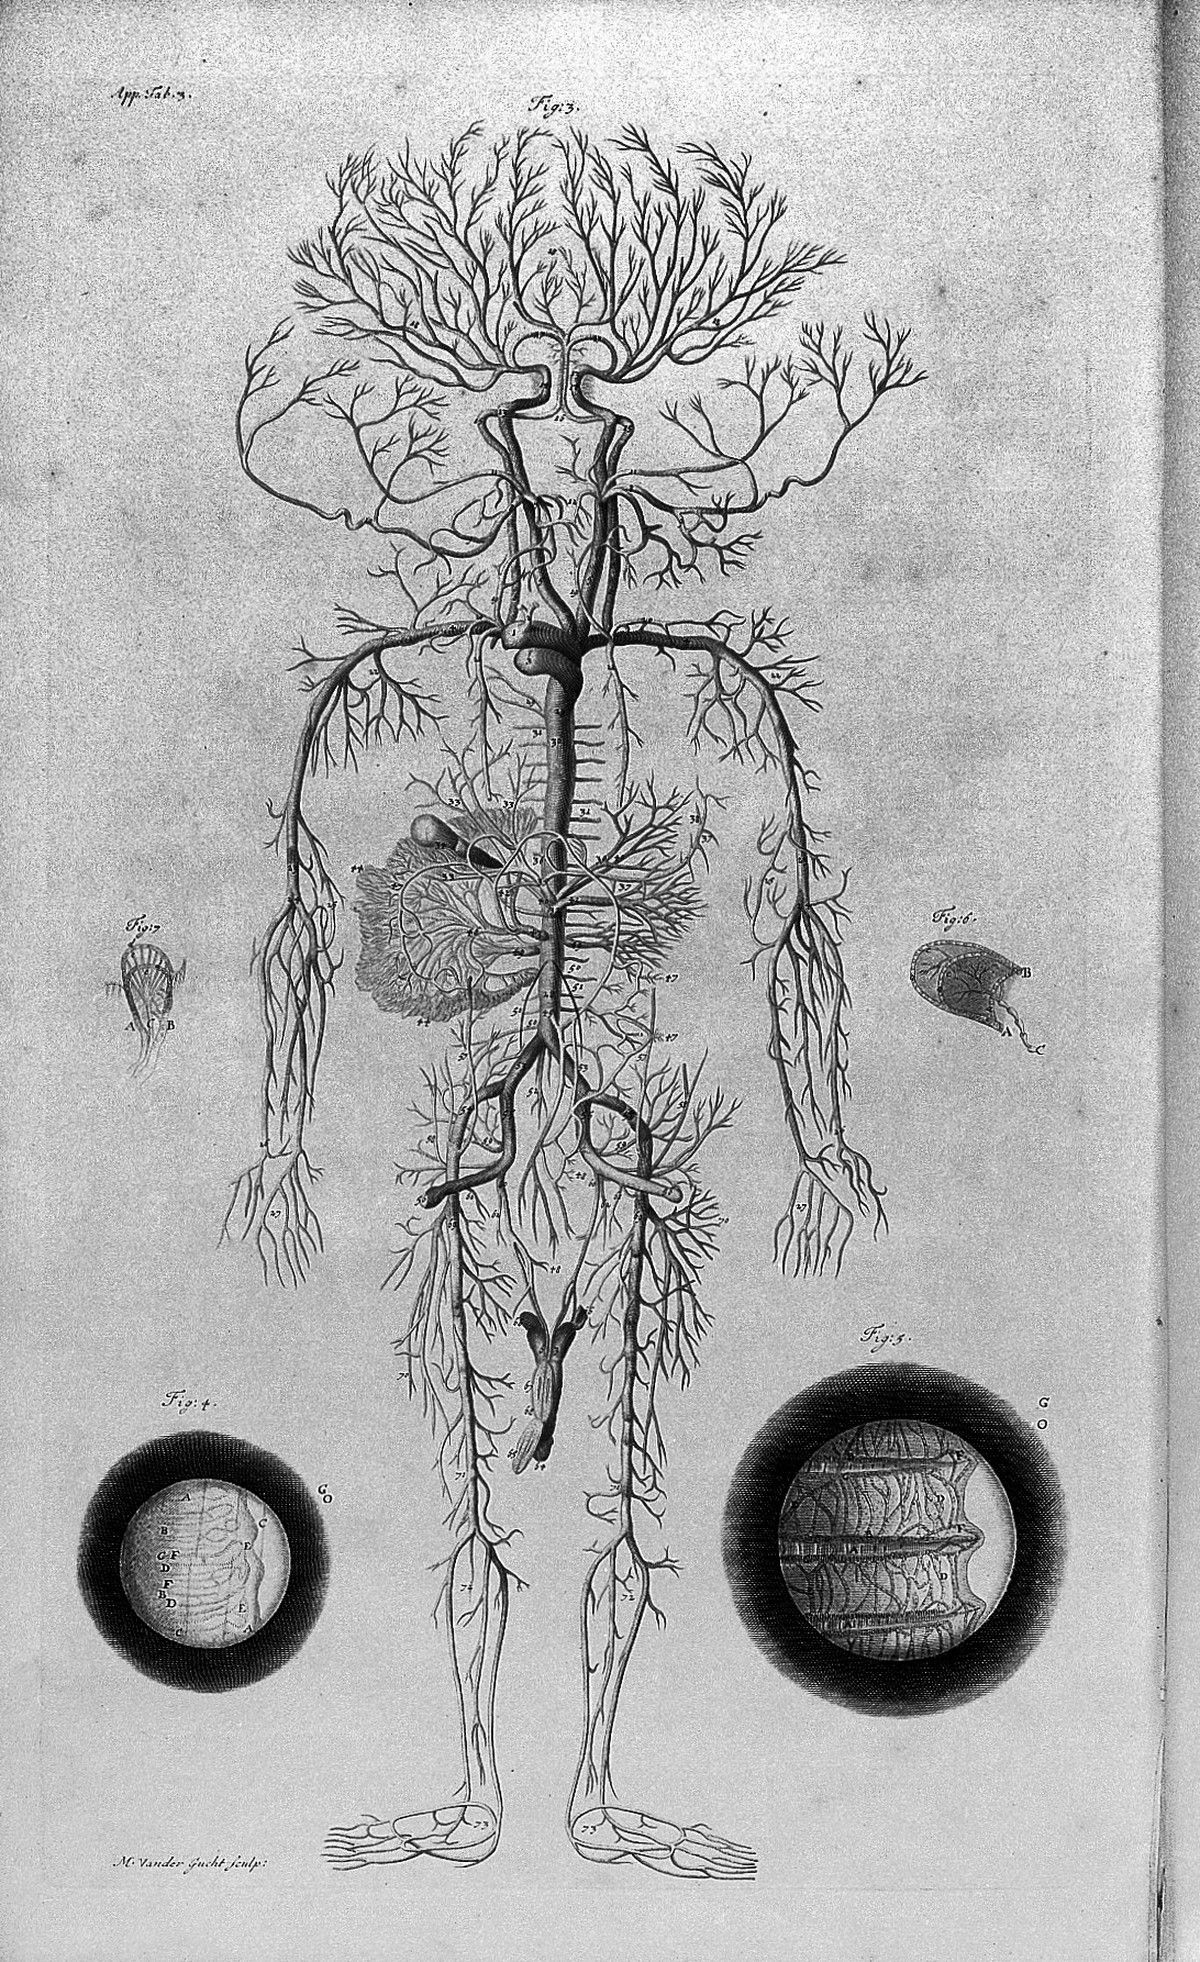 COWPER, William {1666-1709} W. Cowper, The anatomy of humane bodies ...